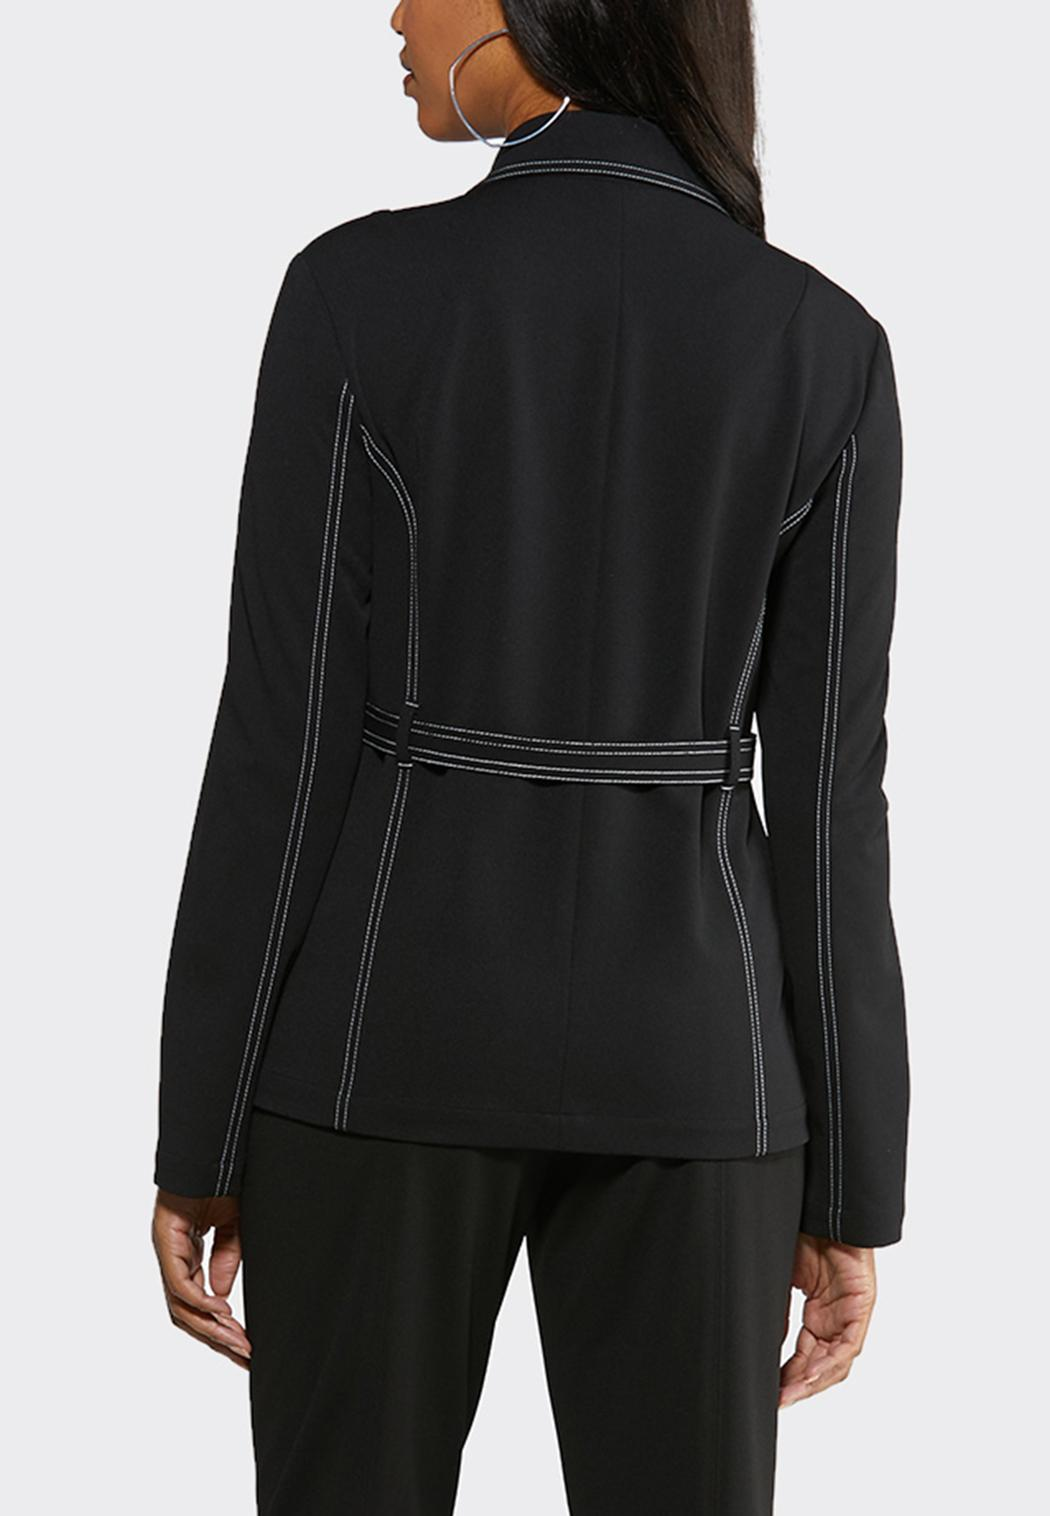 Contrast Stitch Belted Blazer (Item #43996081)